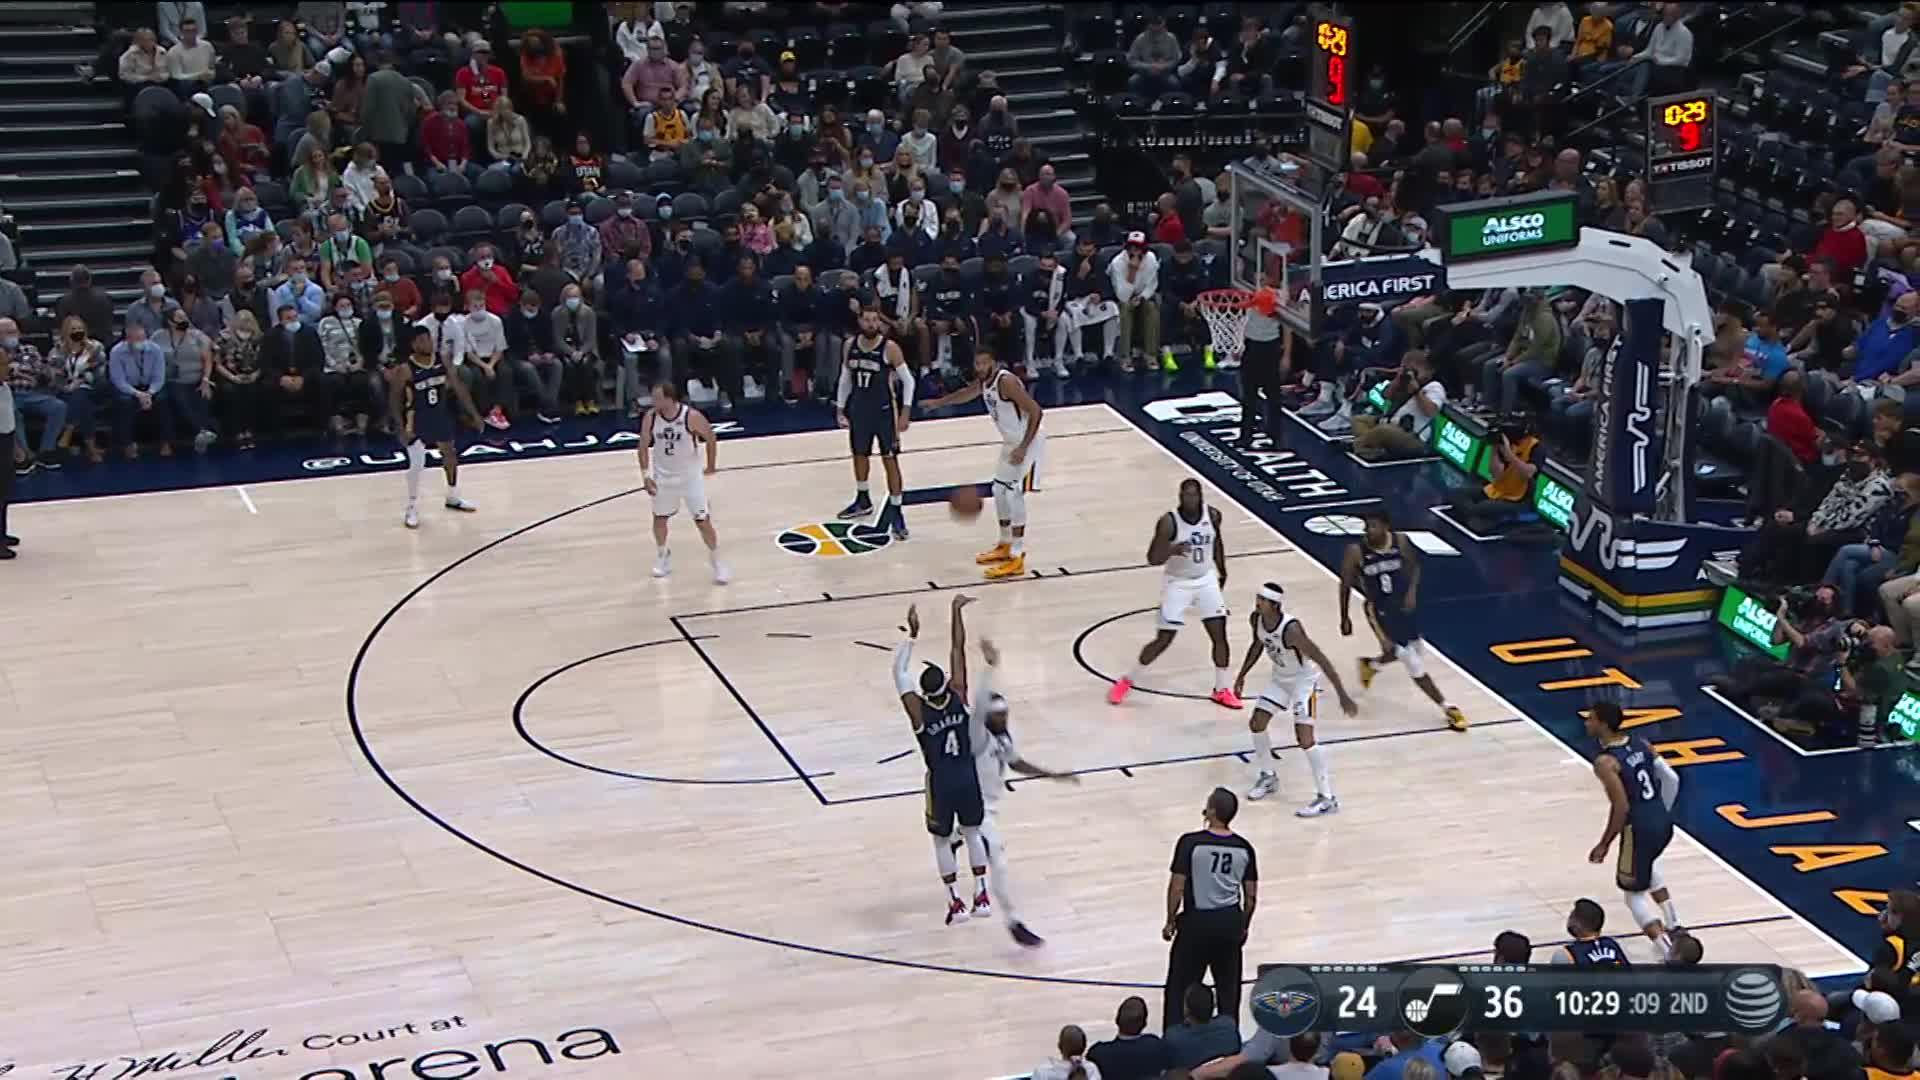 3-pointer by Devonte' Graham off the assist by Jonas Valanciunas | Pelicans Preseason: Pelicans at Jazz 10-11-21